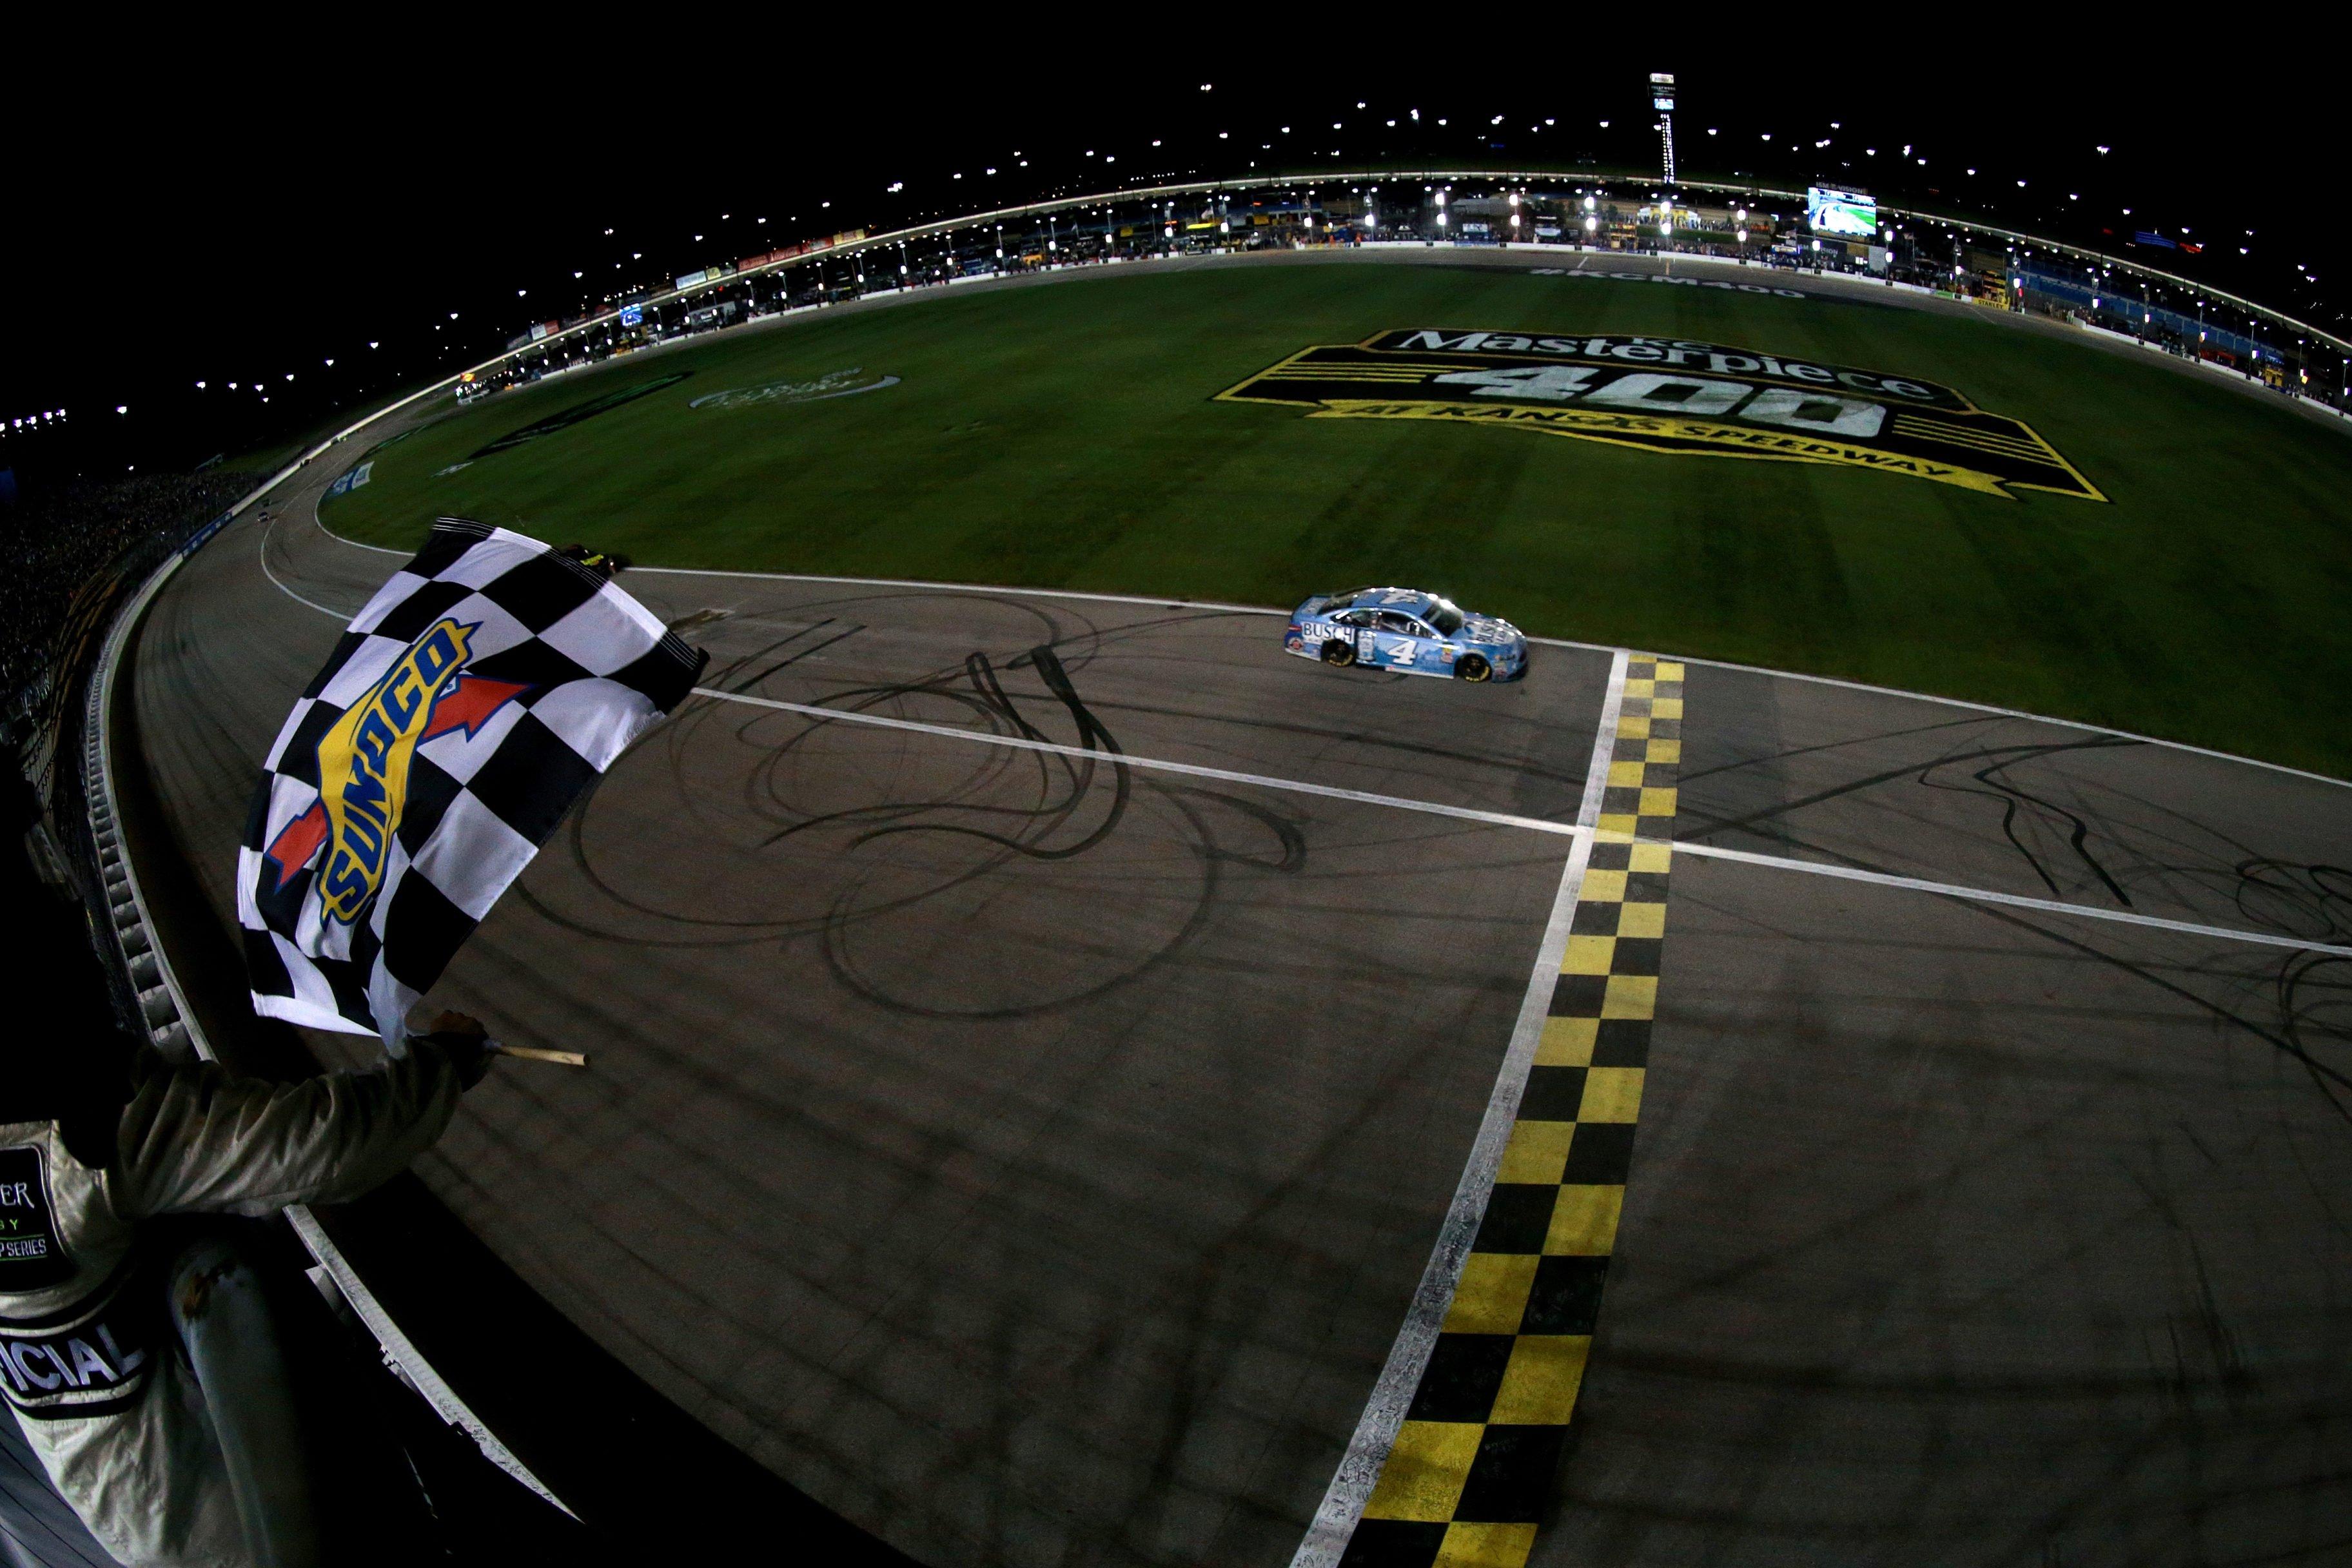 Kevin Harvick wins at Kansas Speedway